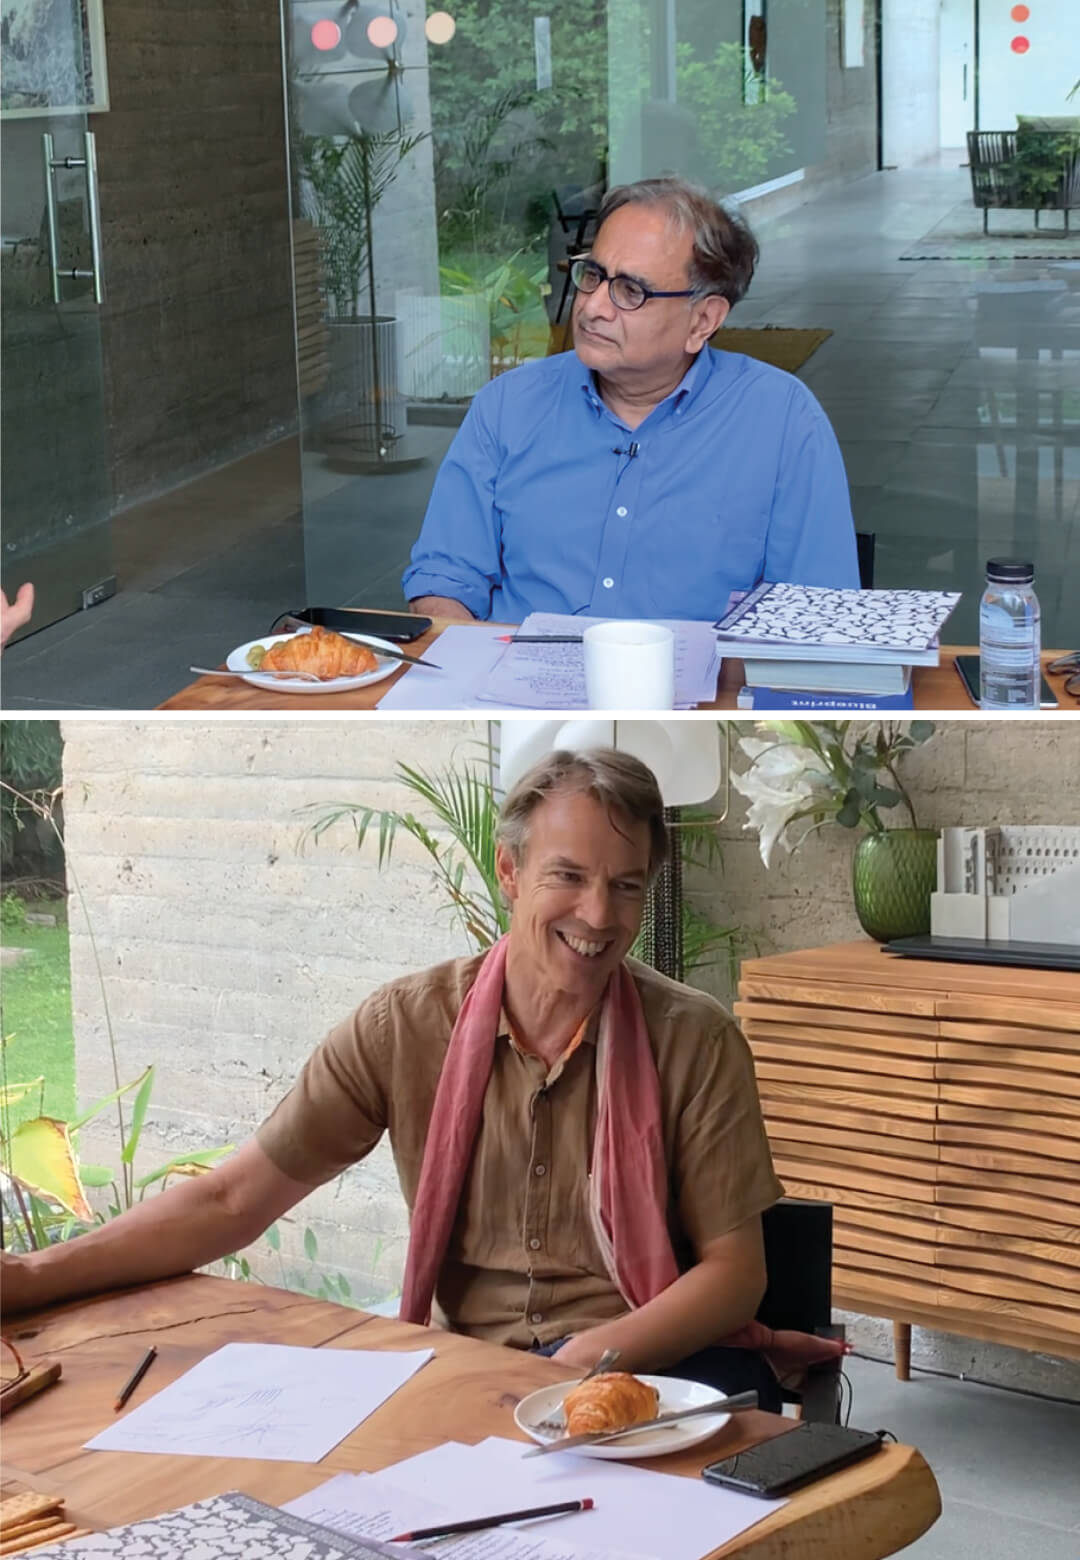 Prof. Anne Feenstra X Gautam Bhatia: Fable, truth and Rendition   Anne Feenstra   Gautam Bhatia   STIRworld